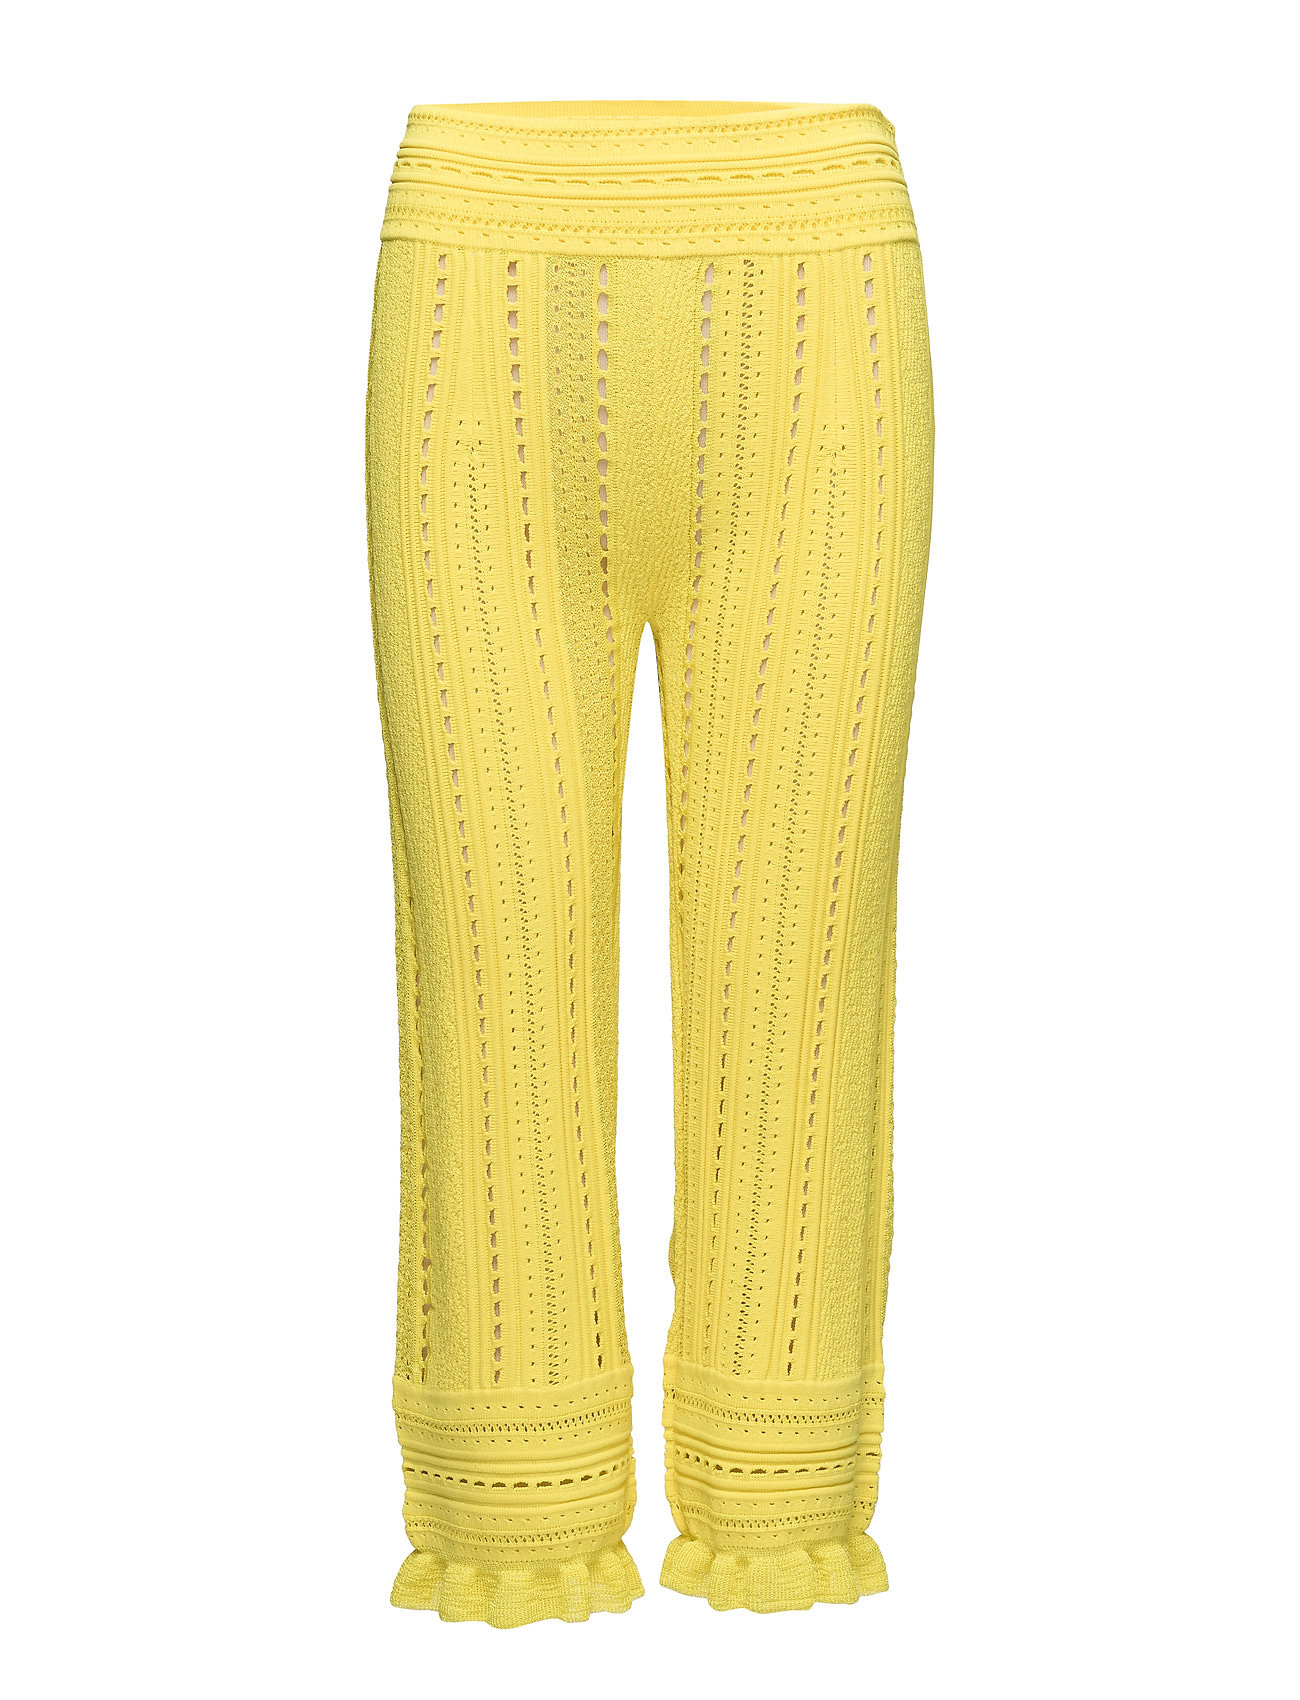 Image of Compact Pointelle Lace Pants Vide Bukser Gul 3.1 PHILLIP LIM (3114230793)